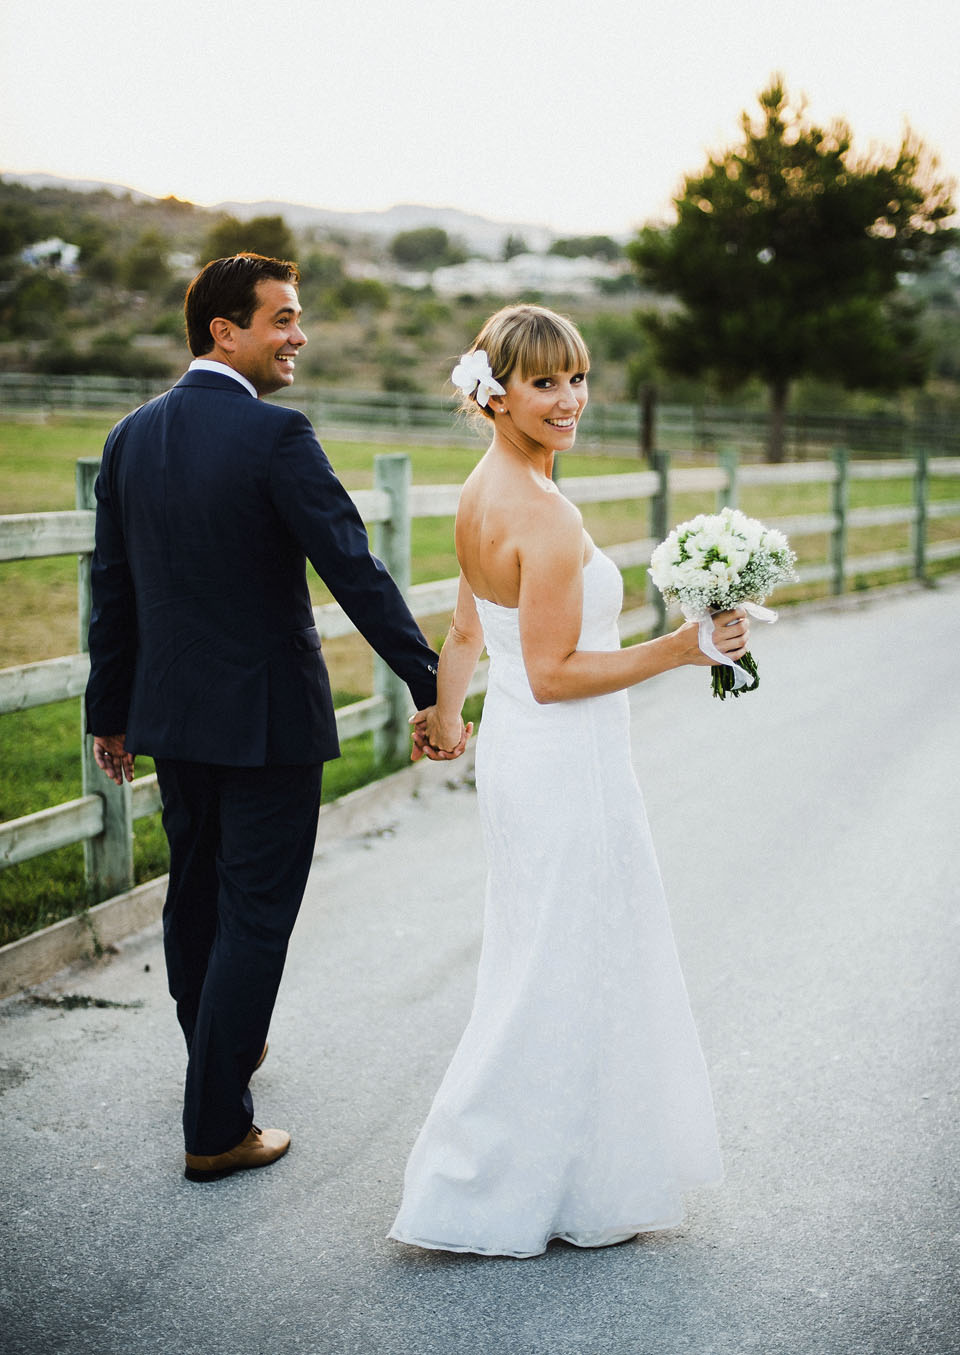 https://www.bikinibirdie.com/images/RANDOM_BLOG/spanish_wedding.jpg